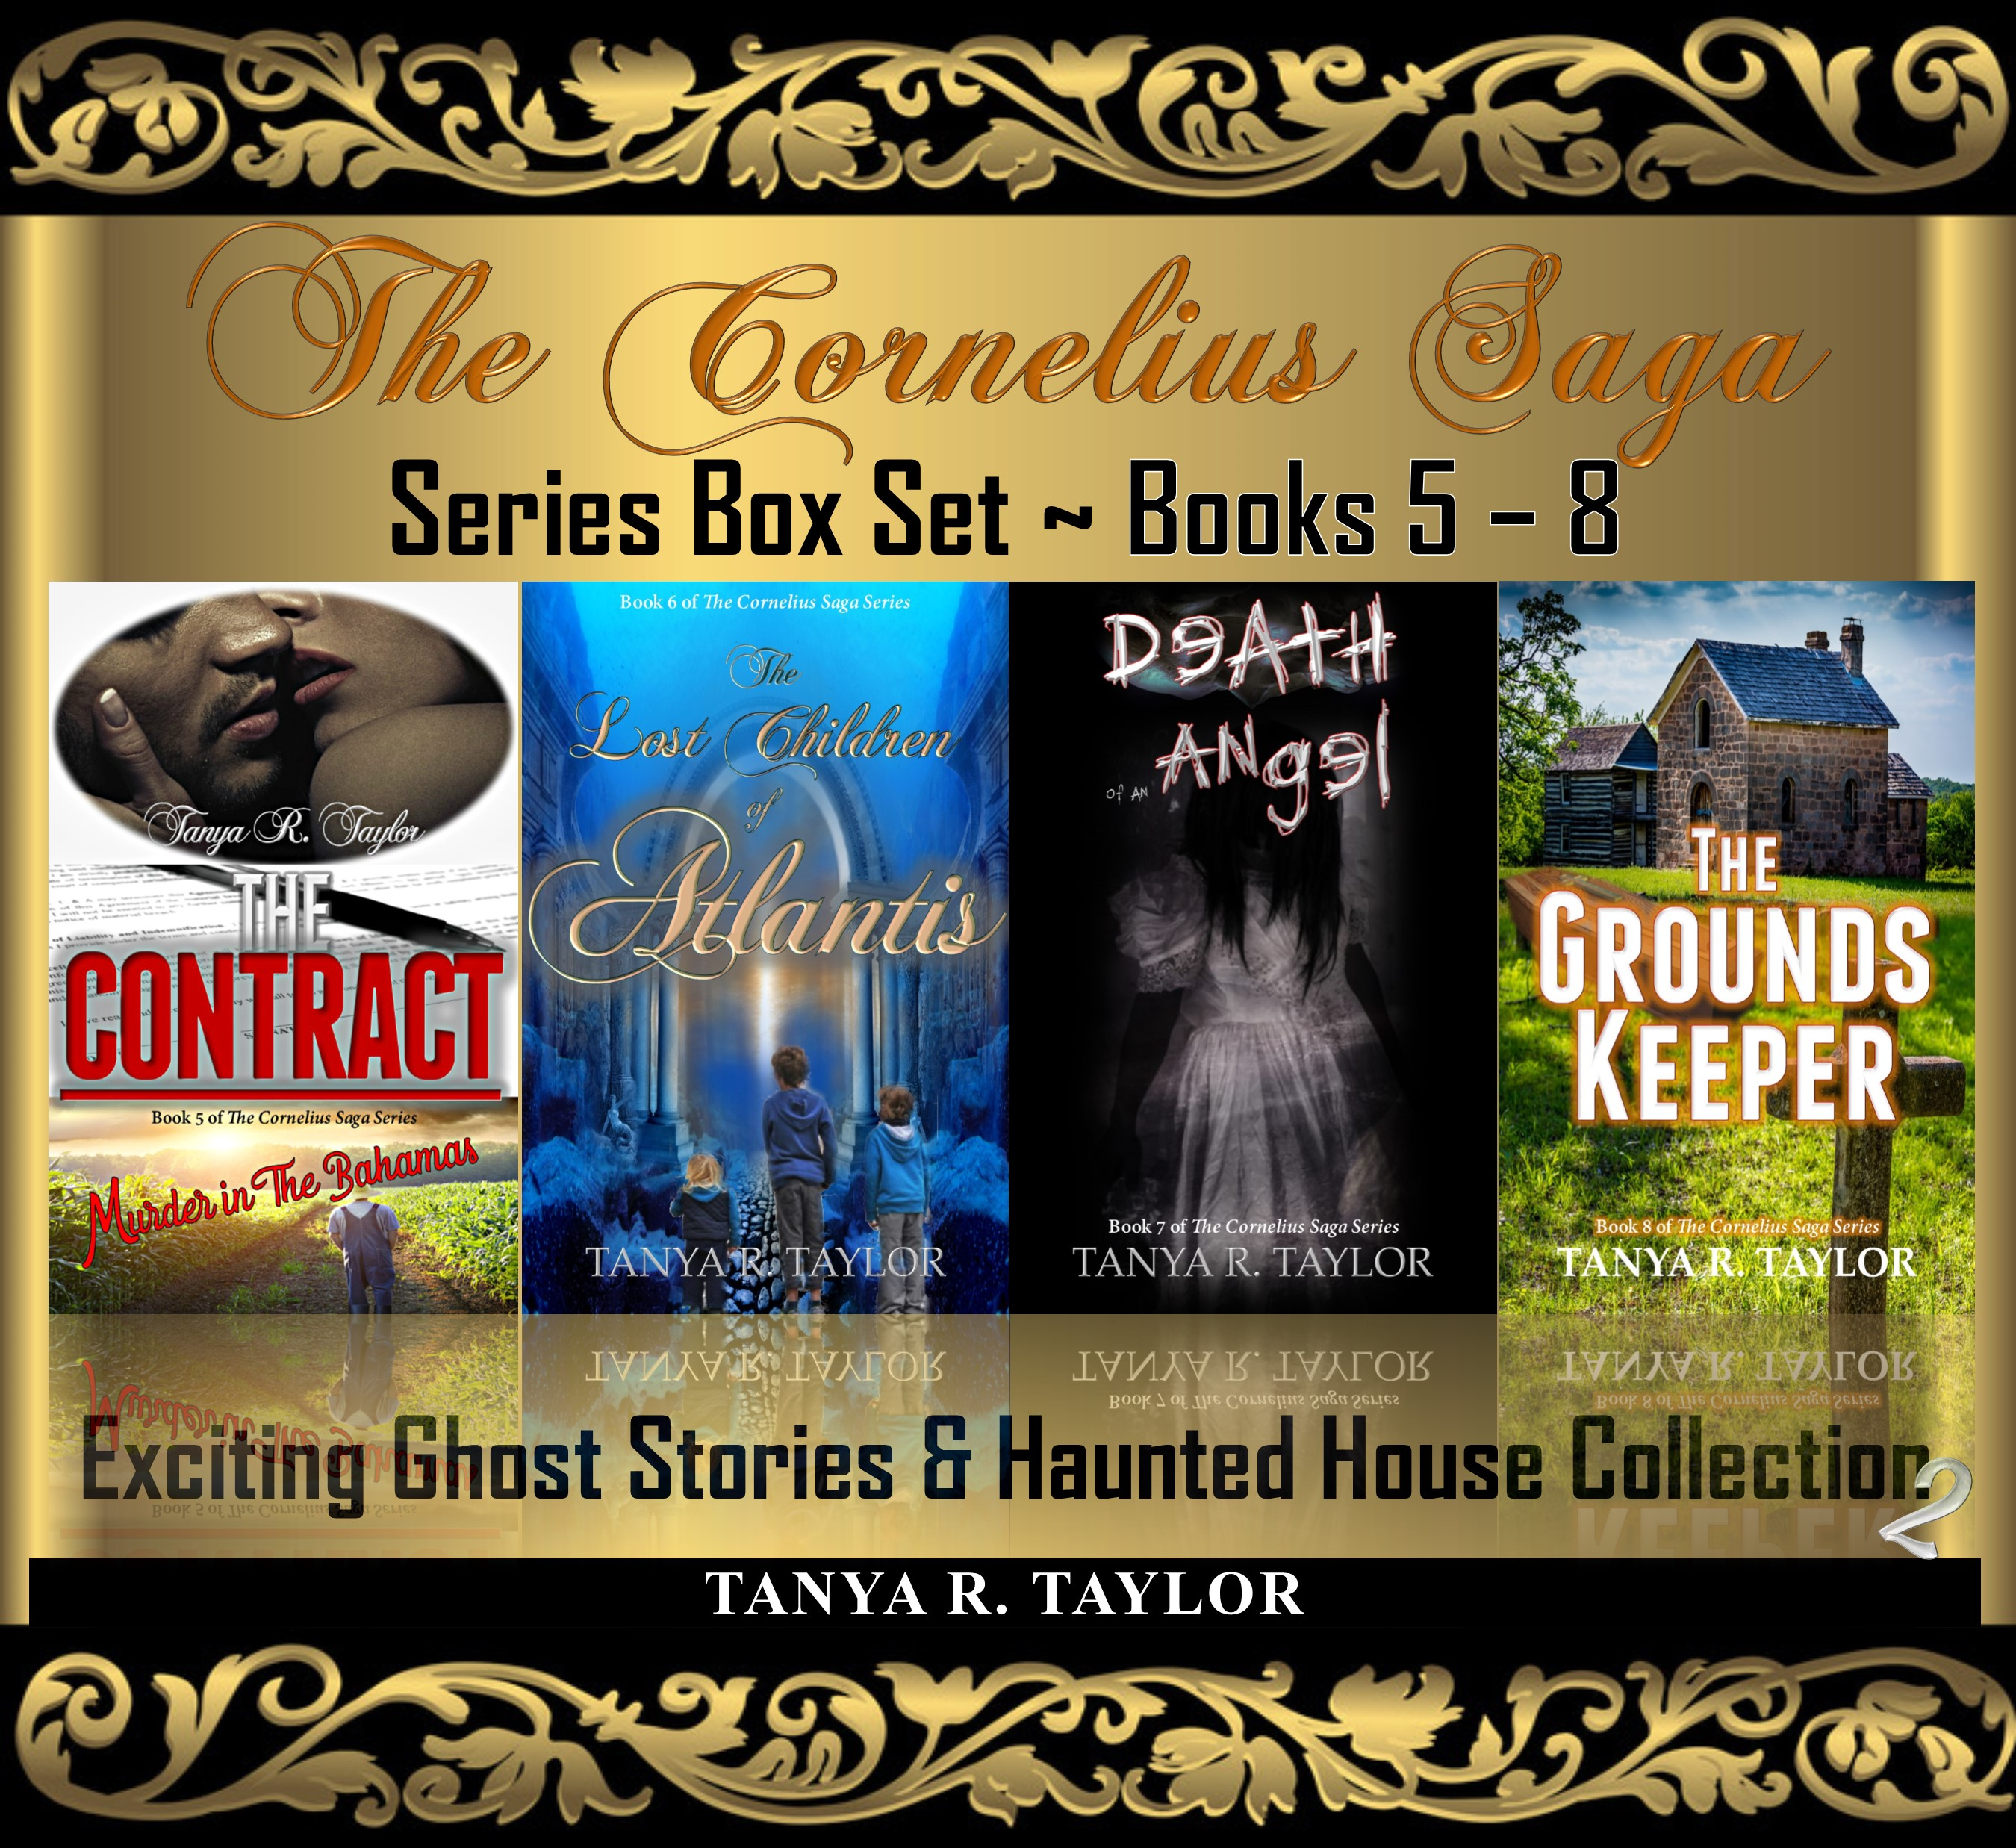 Cornelius series box set books 5-8 LGR